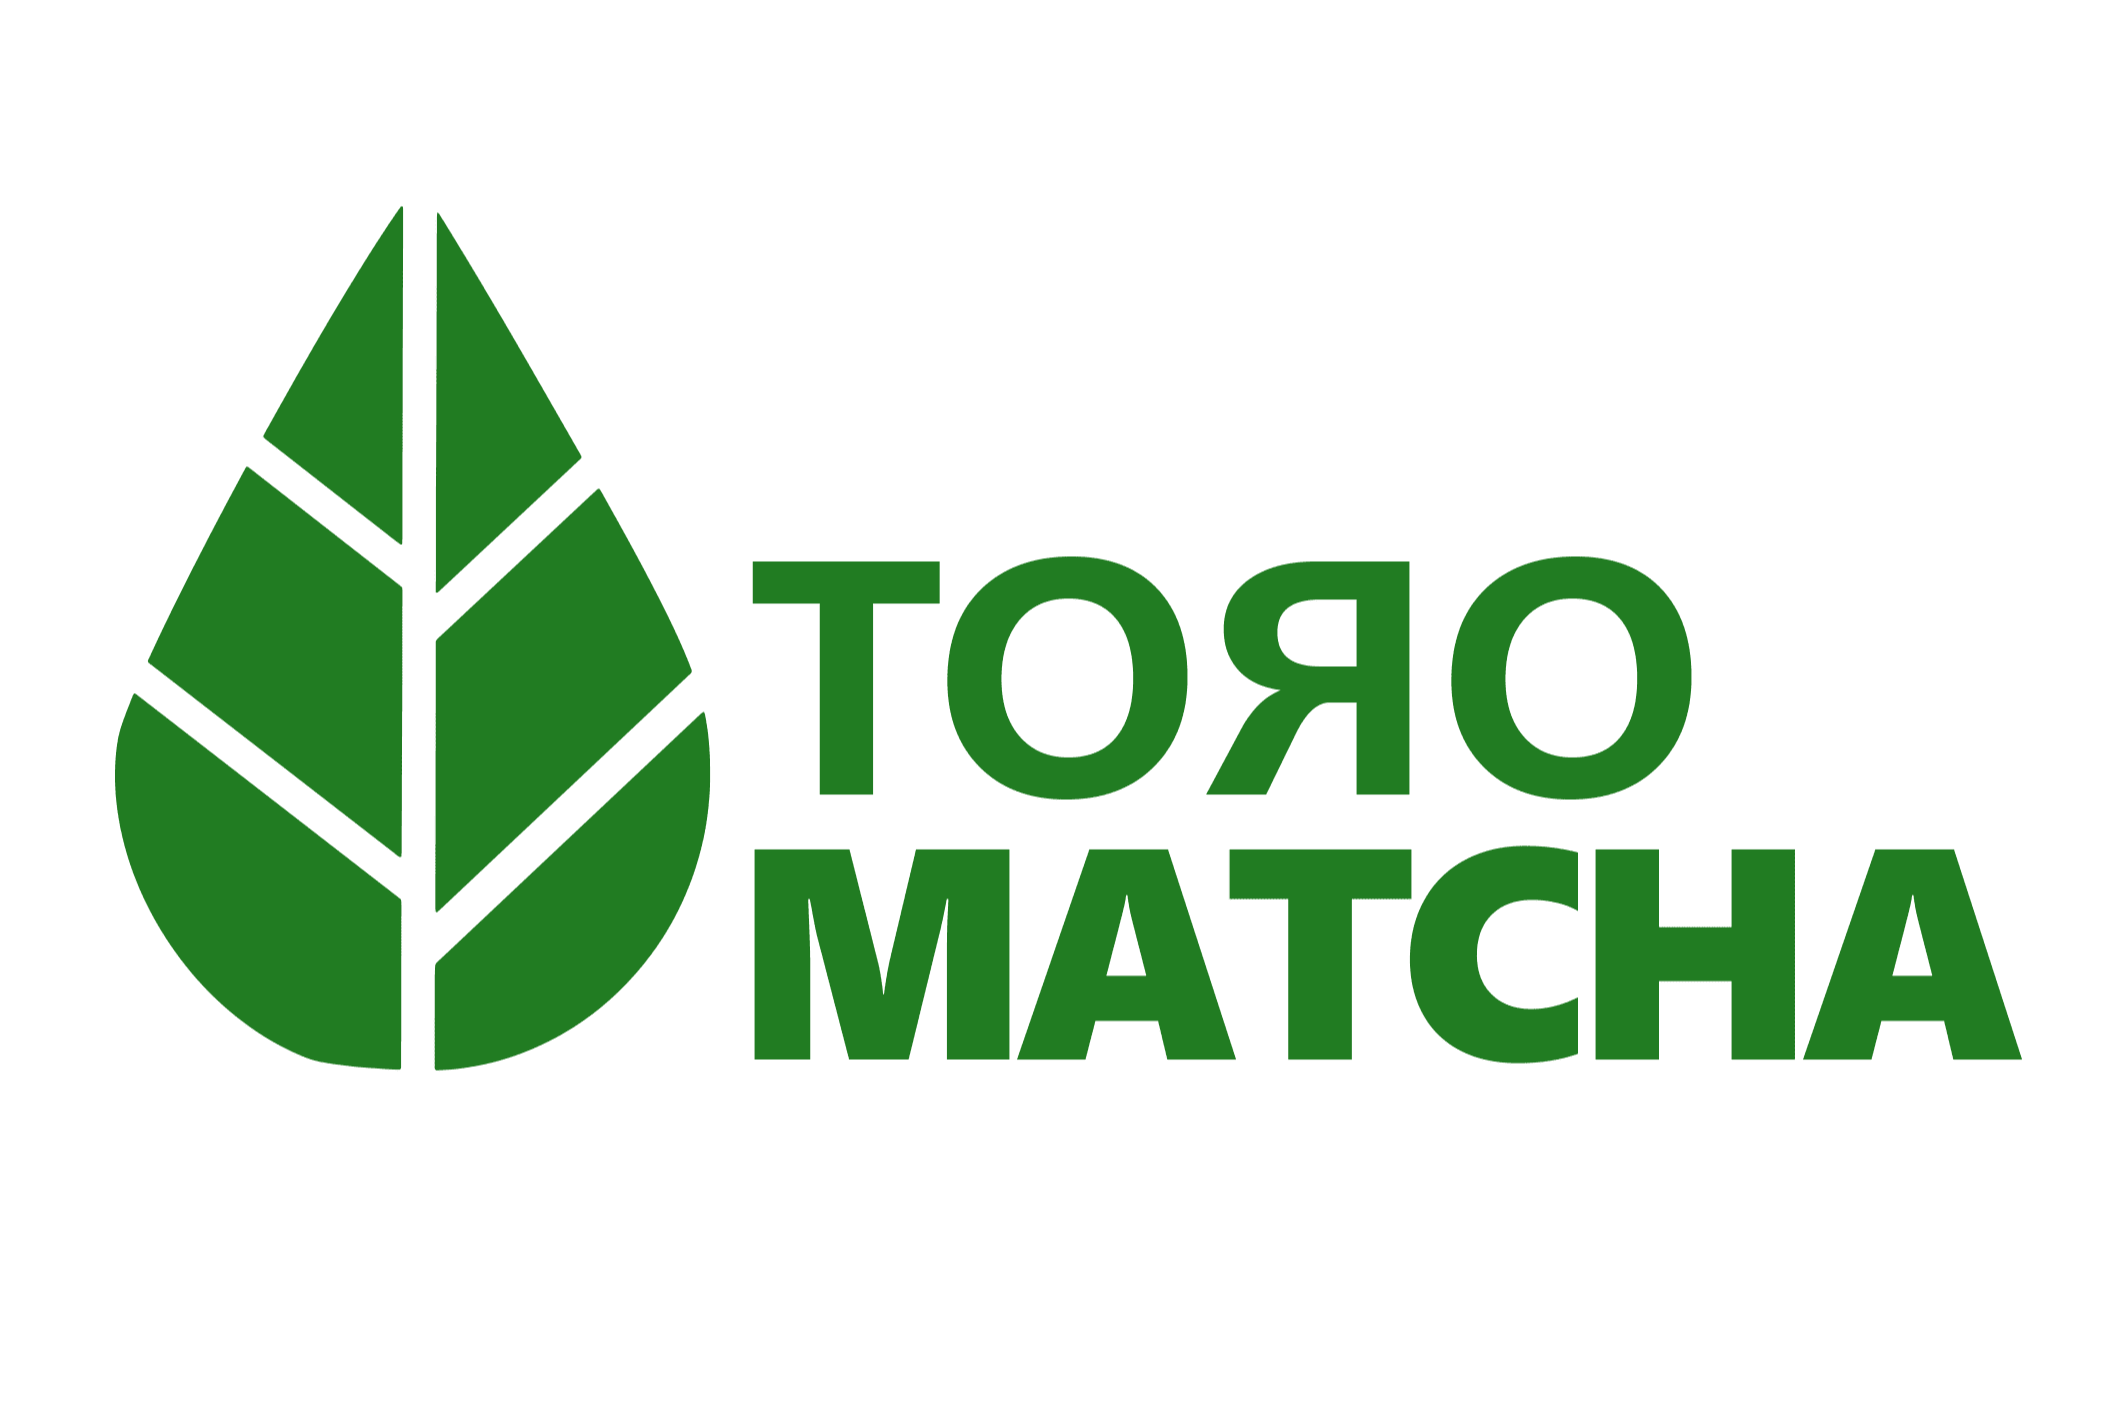 https://toromatcha.com/fr